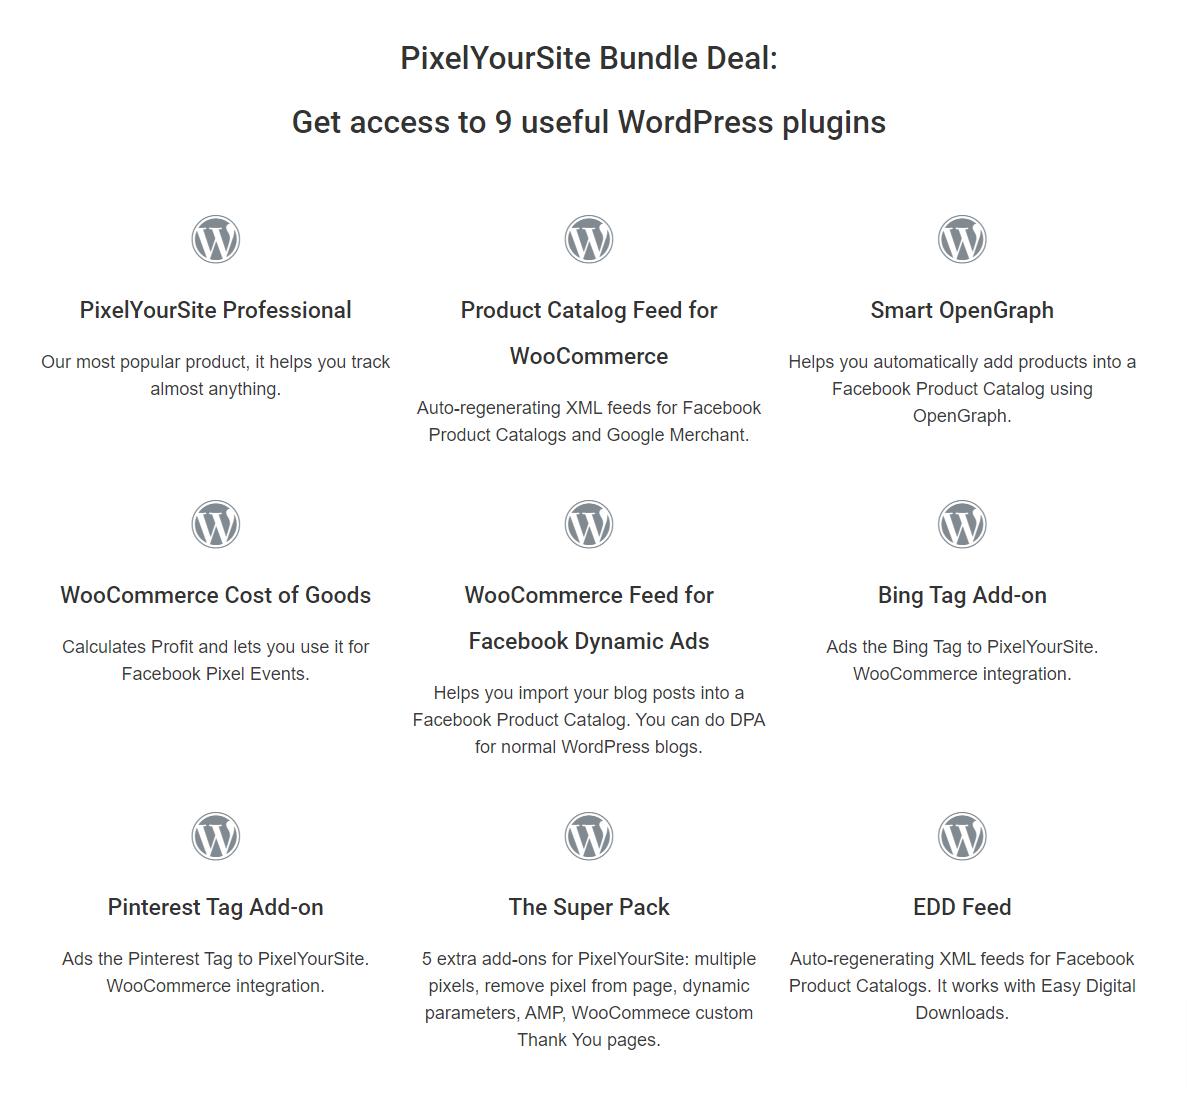 PixelYourSite Bundle Deal Get access to 9 useful WordPress plugins